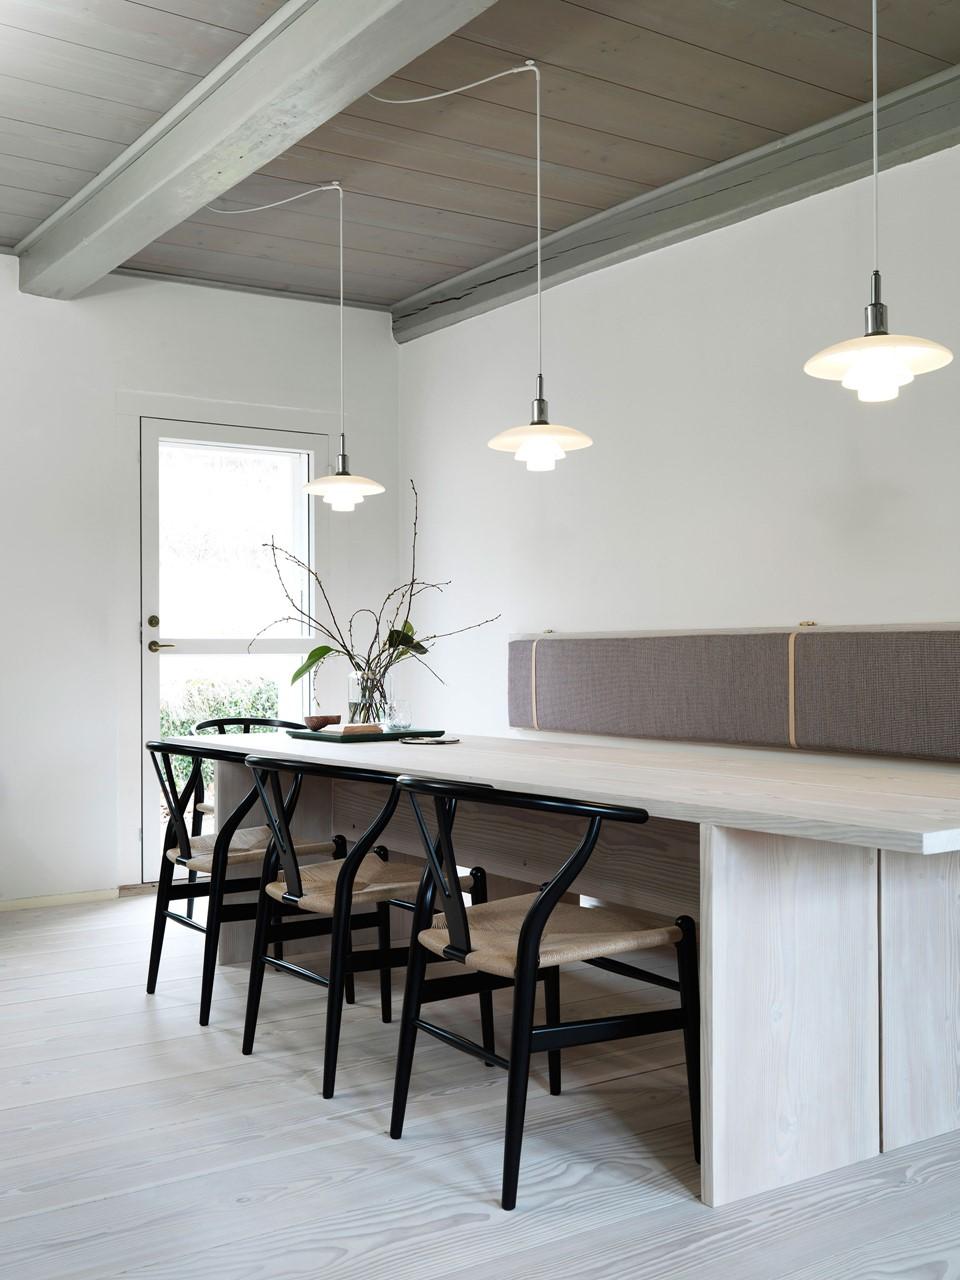 douglas fir floor lye white soap underfloor heating hygge nook dinesen country home.jpg